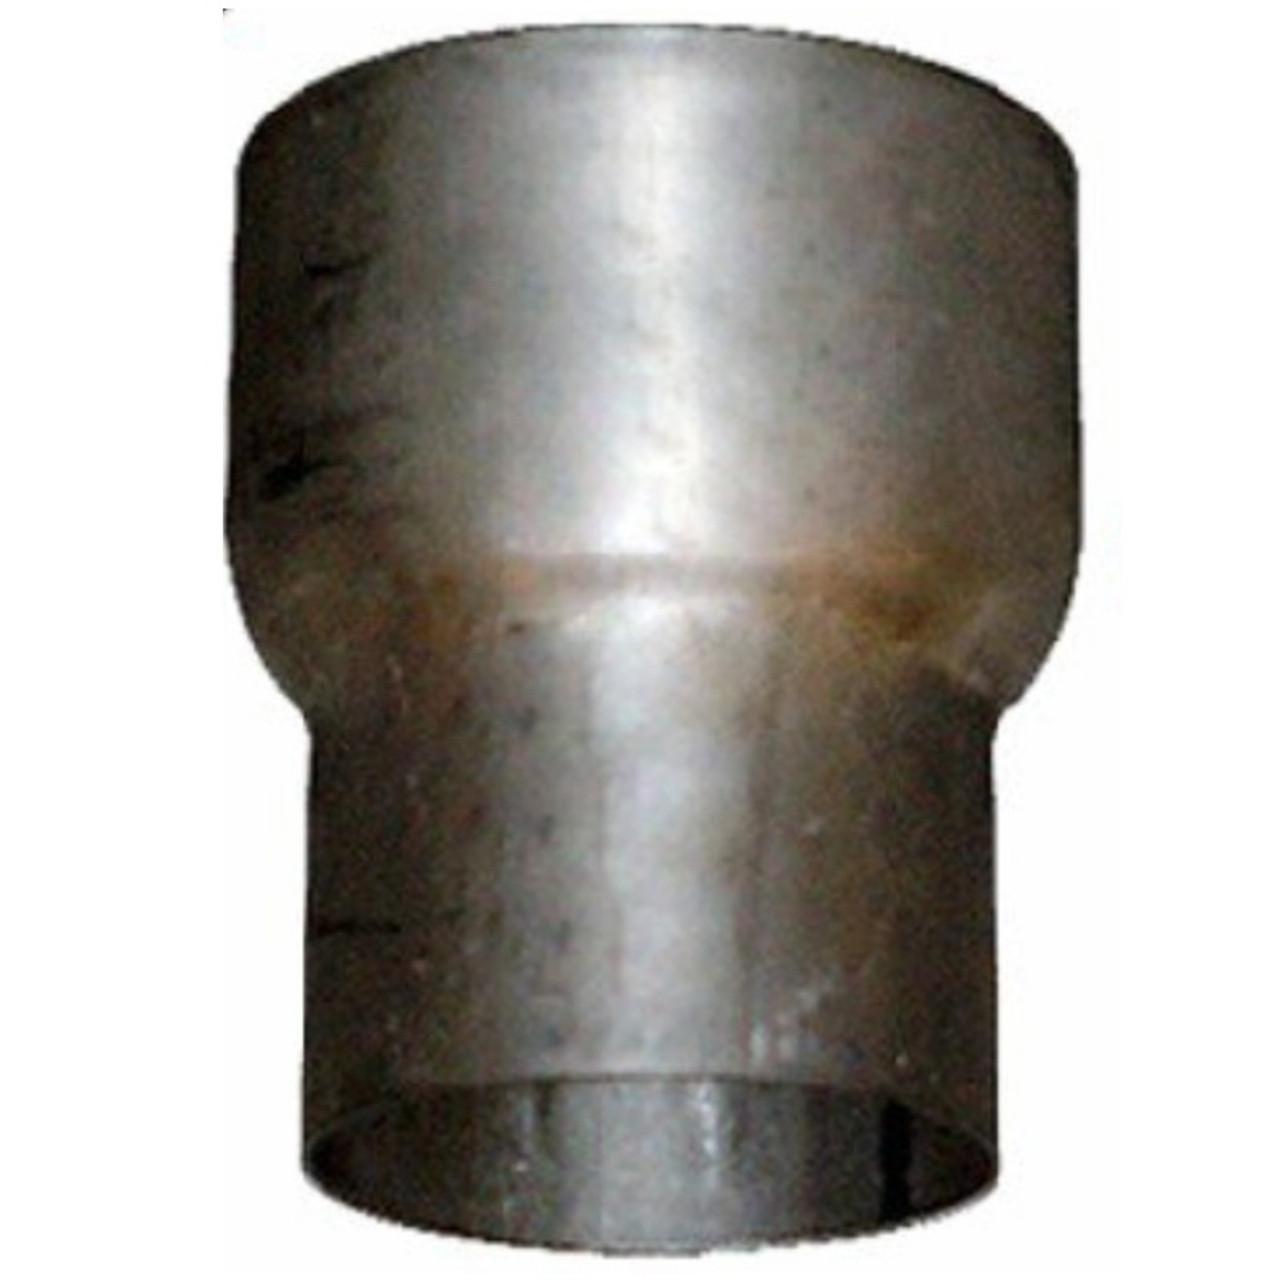 7 od to 5 od exhaust reducer aluminized pipe r7o 5oa